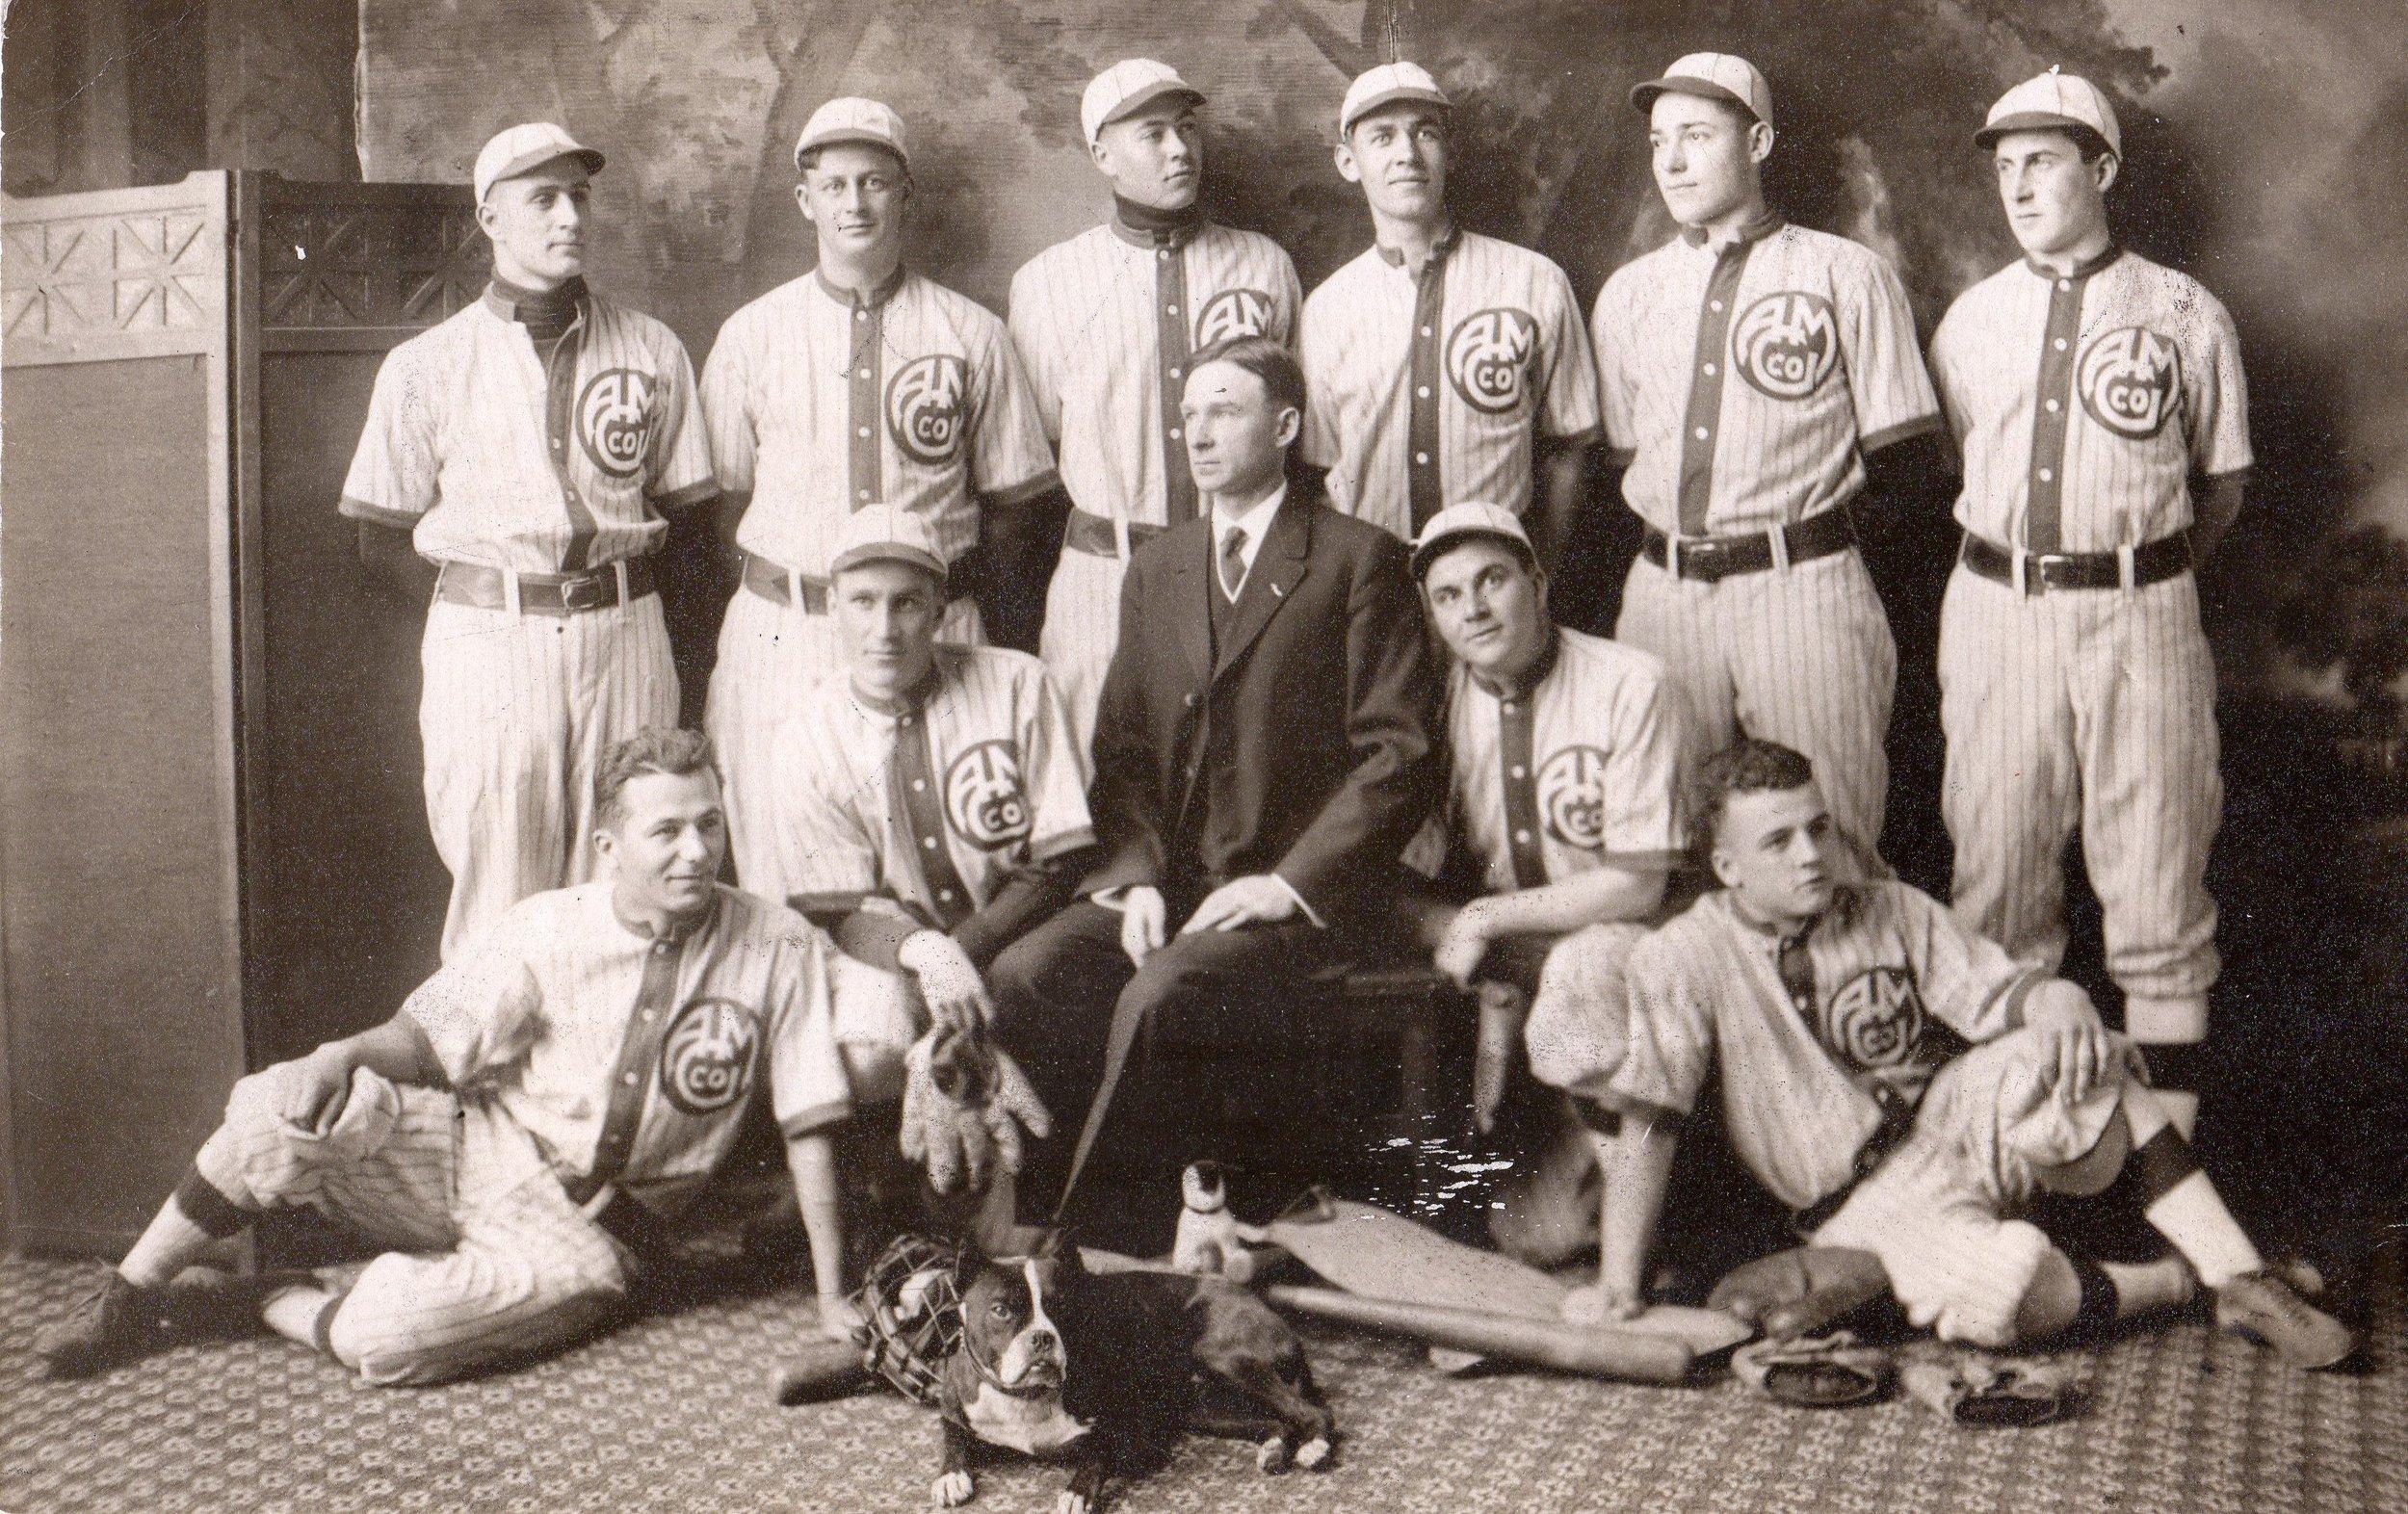 Aluminum Goods Base Ball team, circa 1910